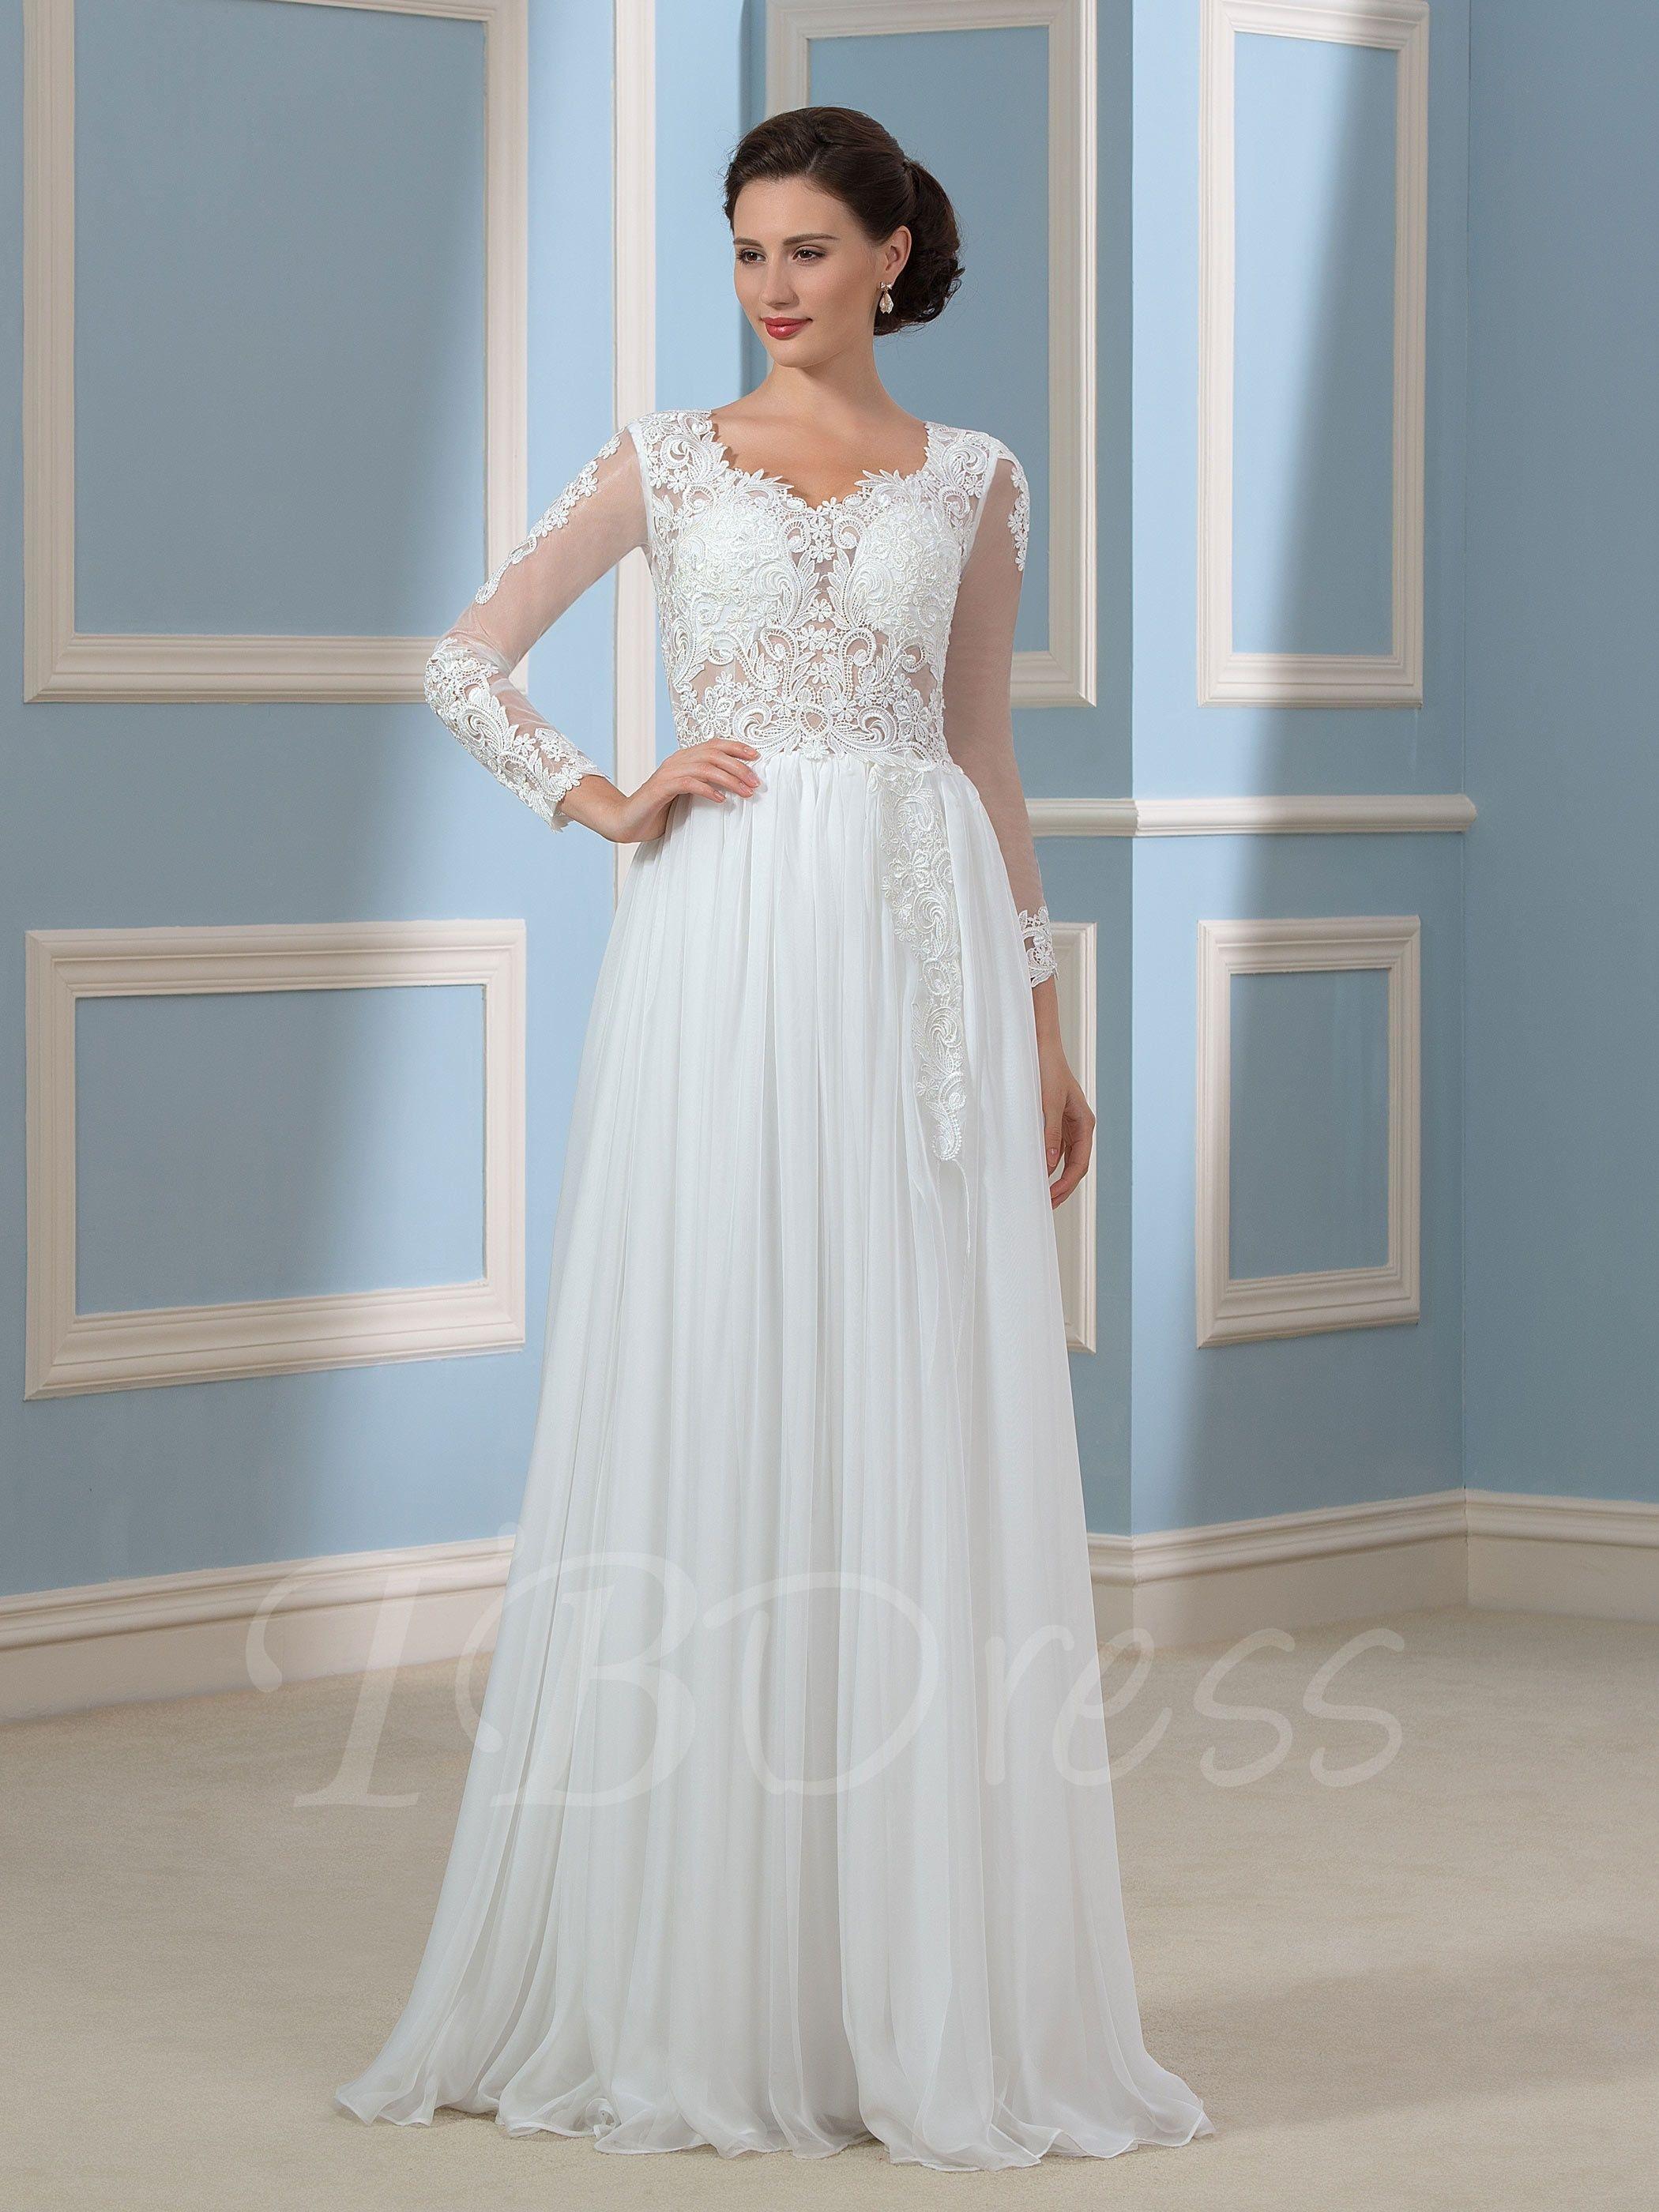 Long sleeve chiffon wedding dress  Long Sleeve SplitFront Lace Beach Wedding Dress  Lace beach